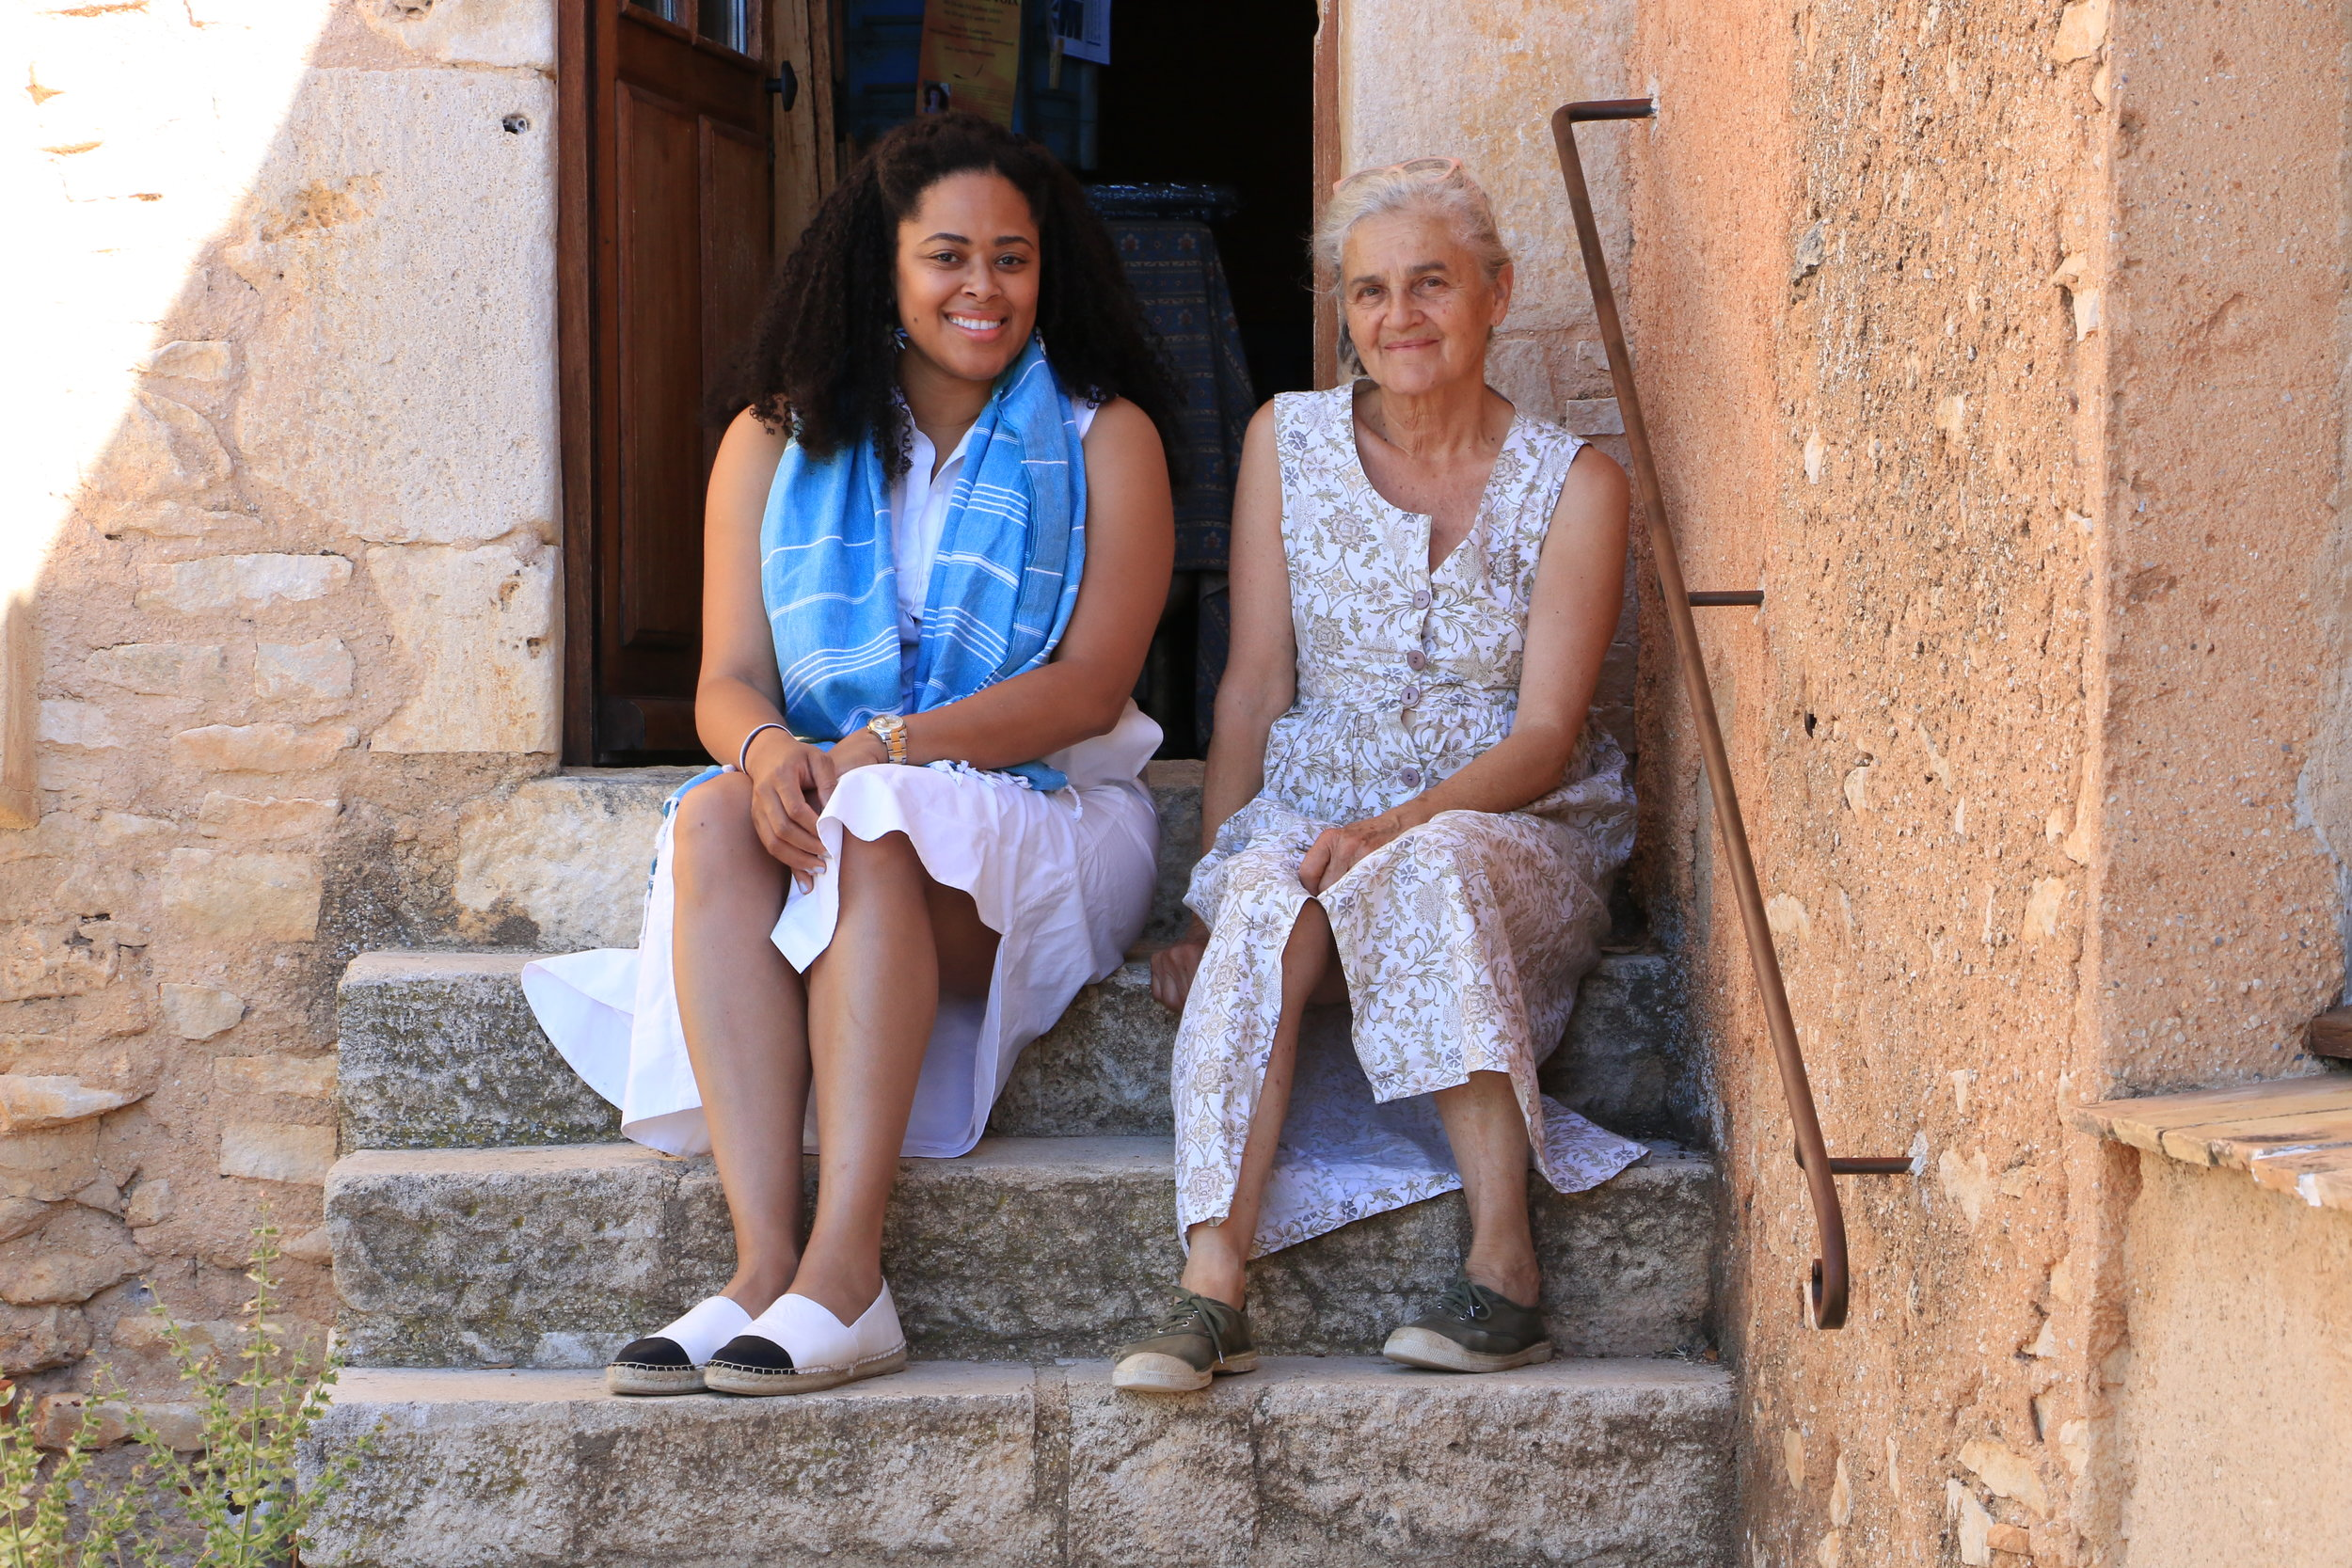 Beatrice,  Provençal Bed + Breakfast proprietor